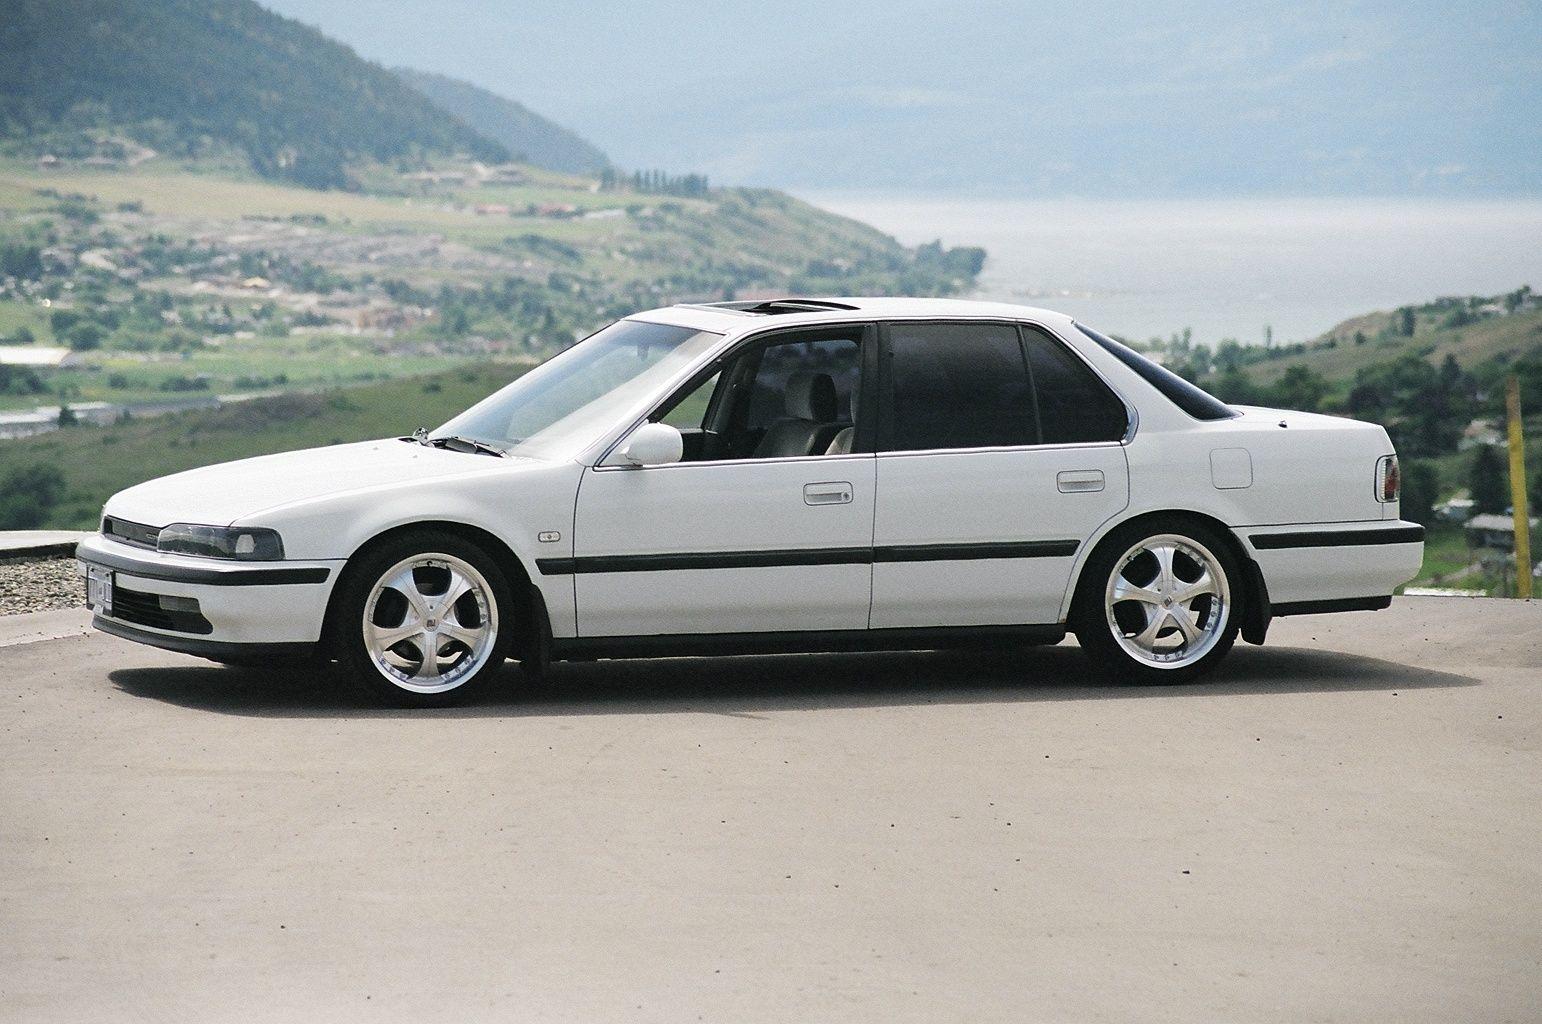 1991 honda accord ex honda accord honda accord, honda accord ex 89 Honda Accord JDM